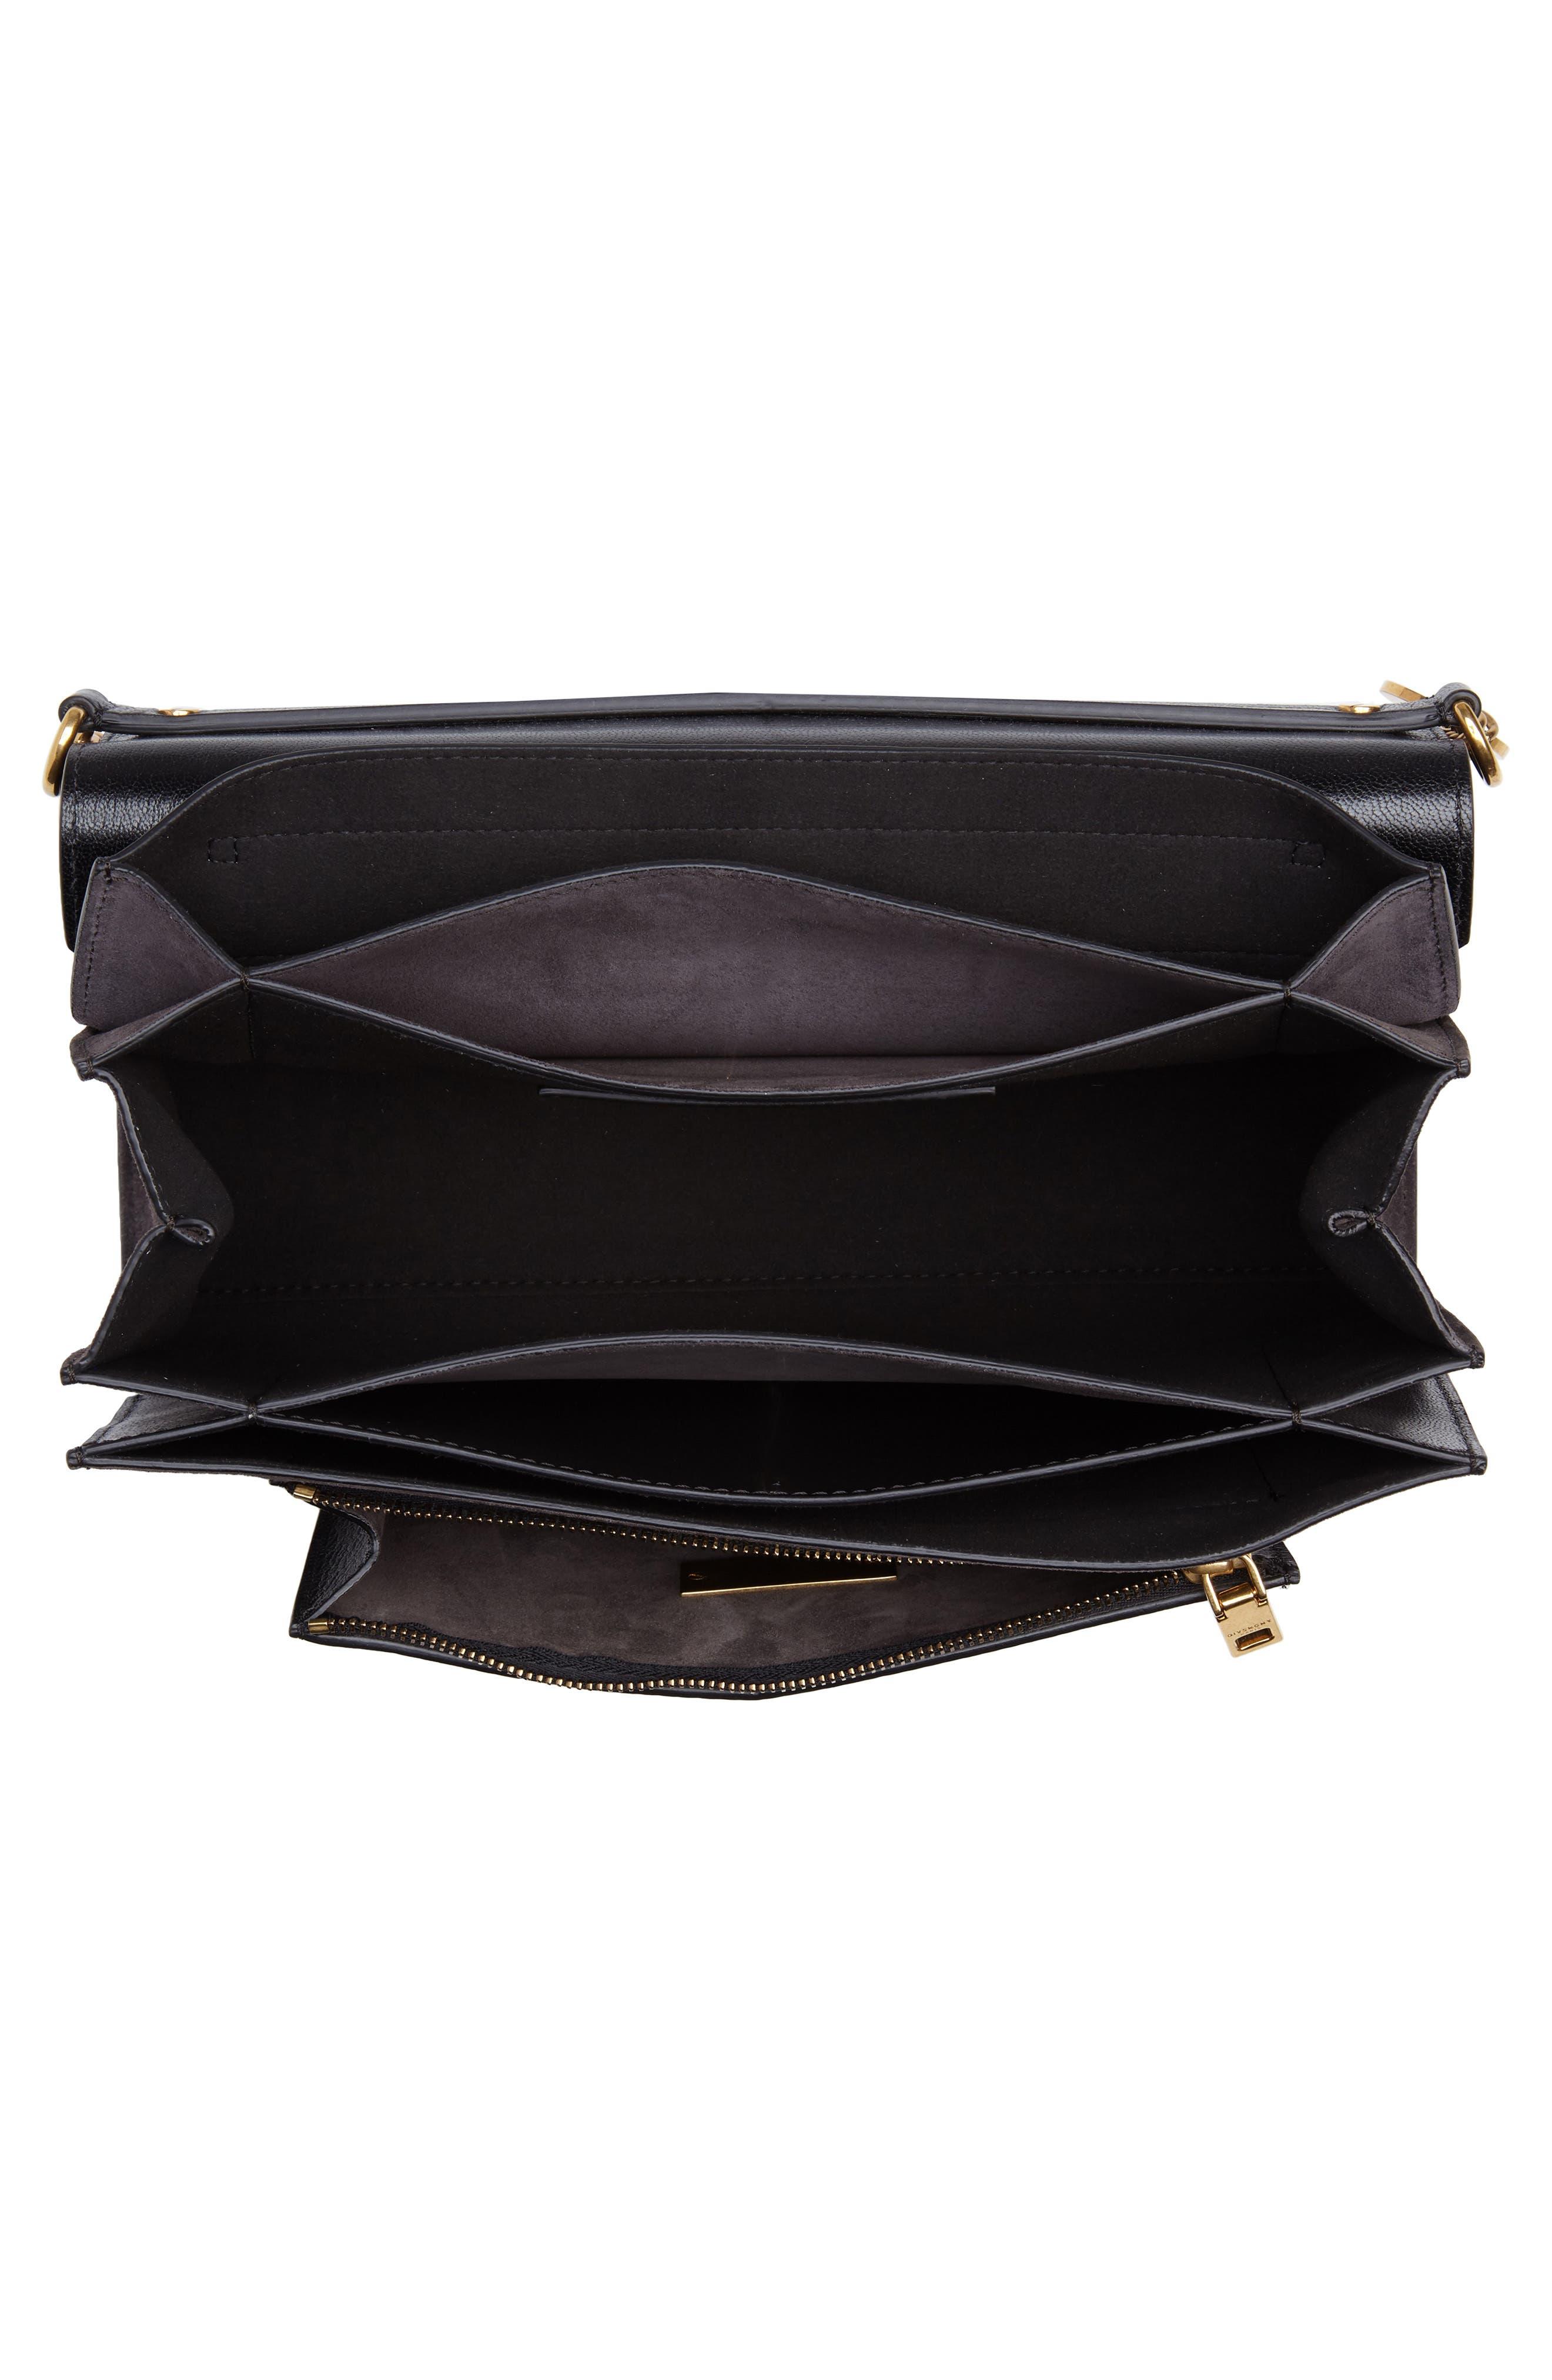 Medium GV3 Leather Crossbody Bag,                             Alternate thumbnail 4, color,                             BLACK/ GREY